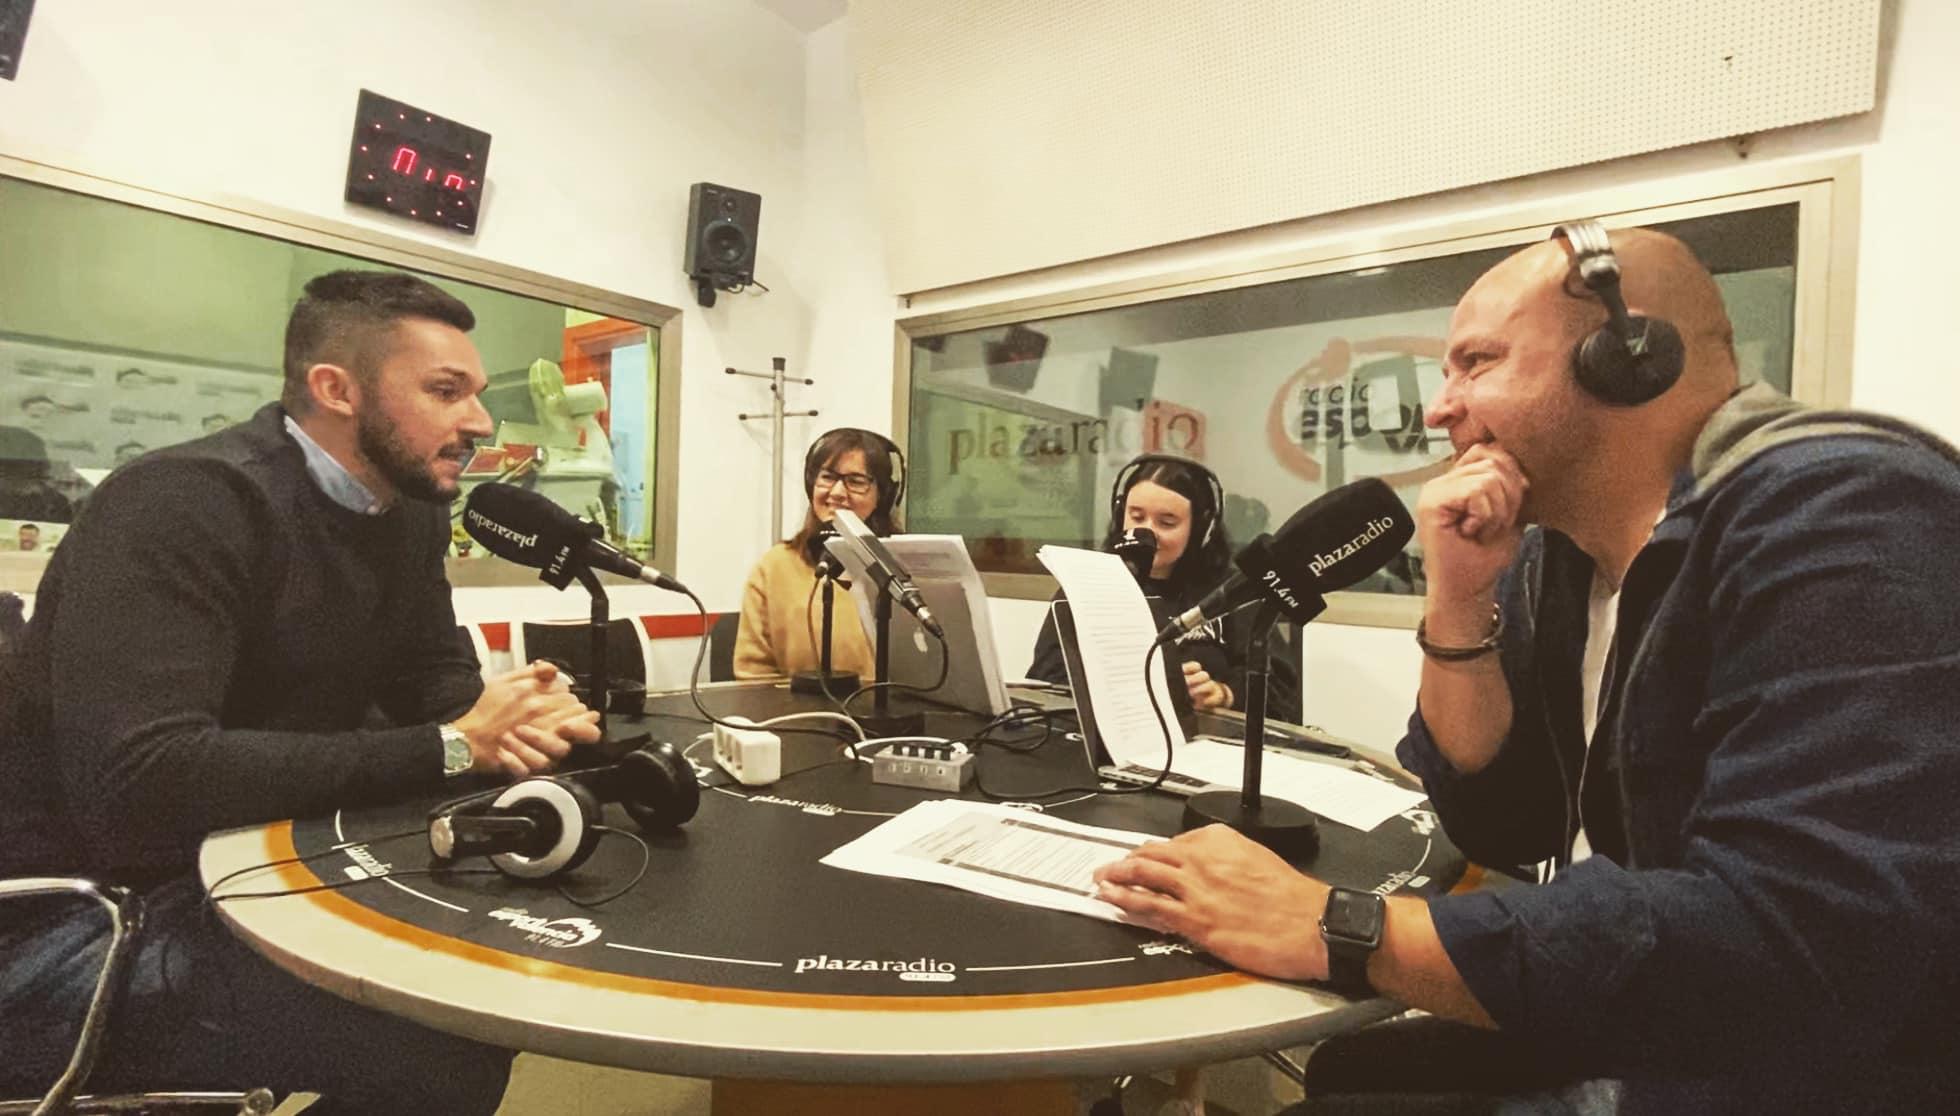 enric valls psicologo experto plaza radio